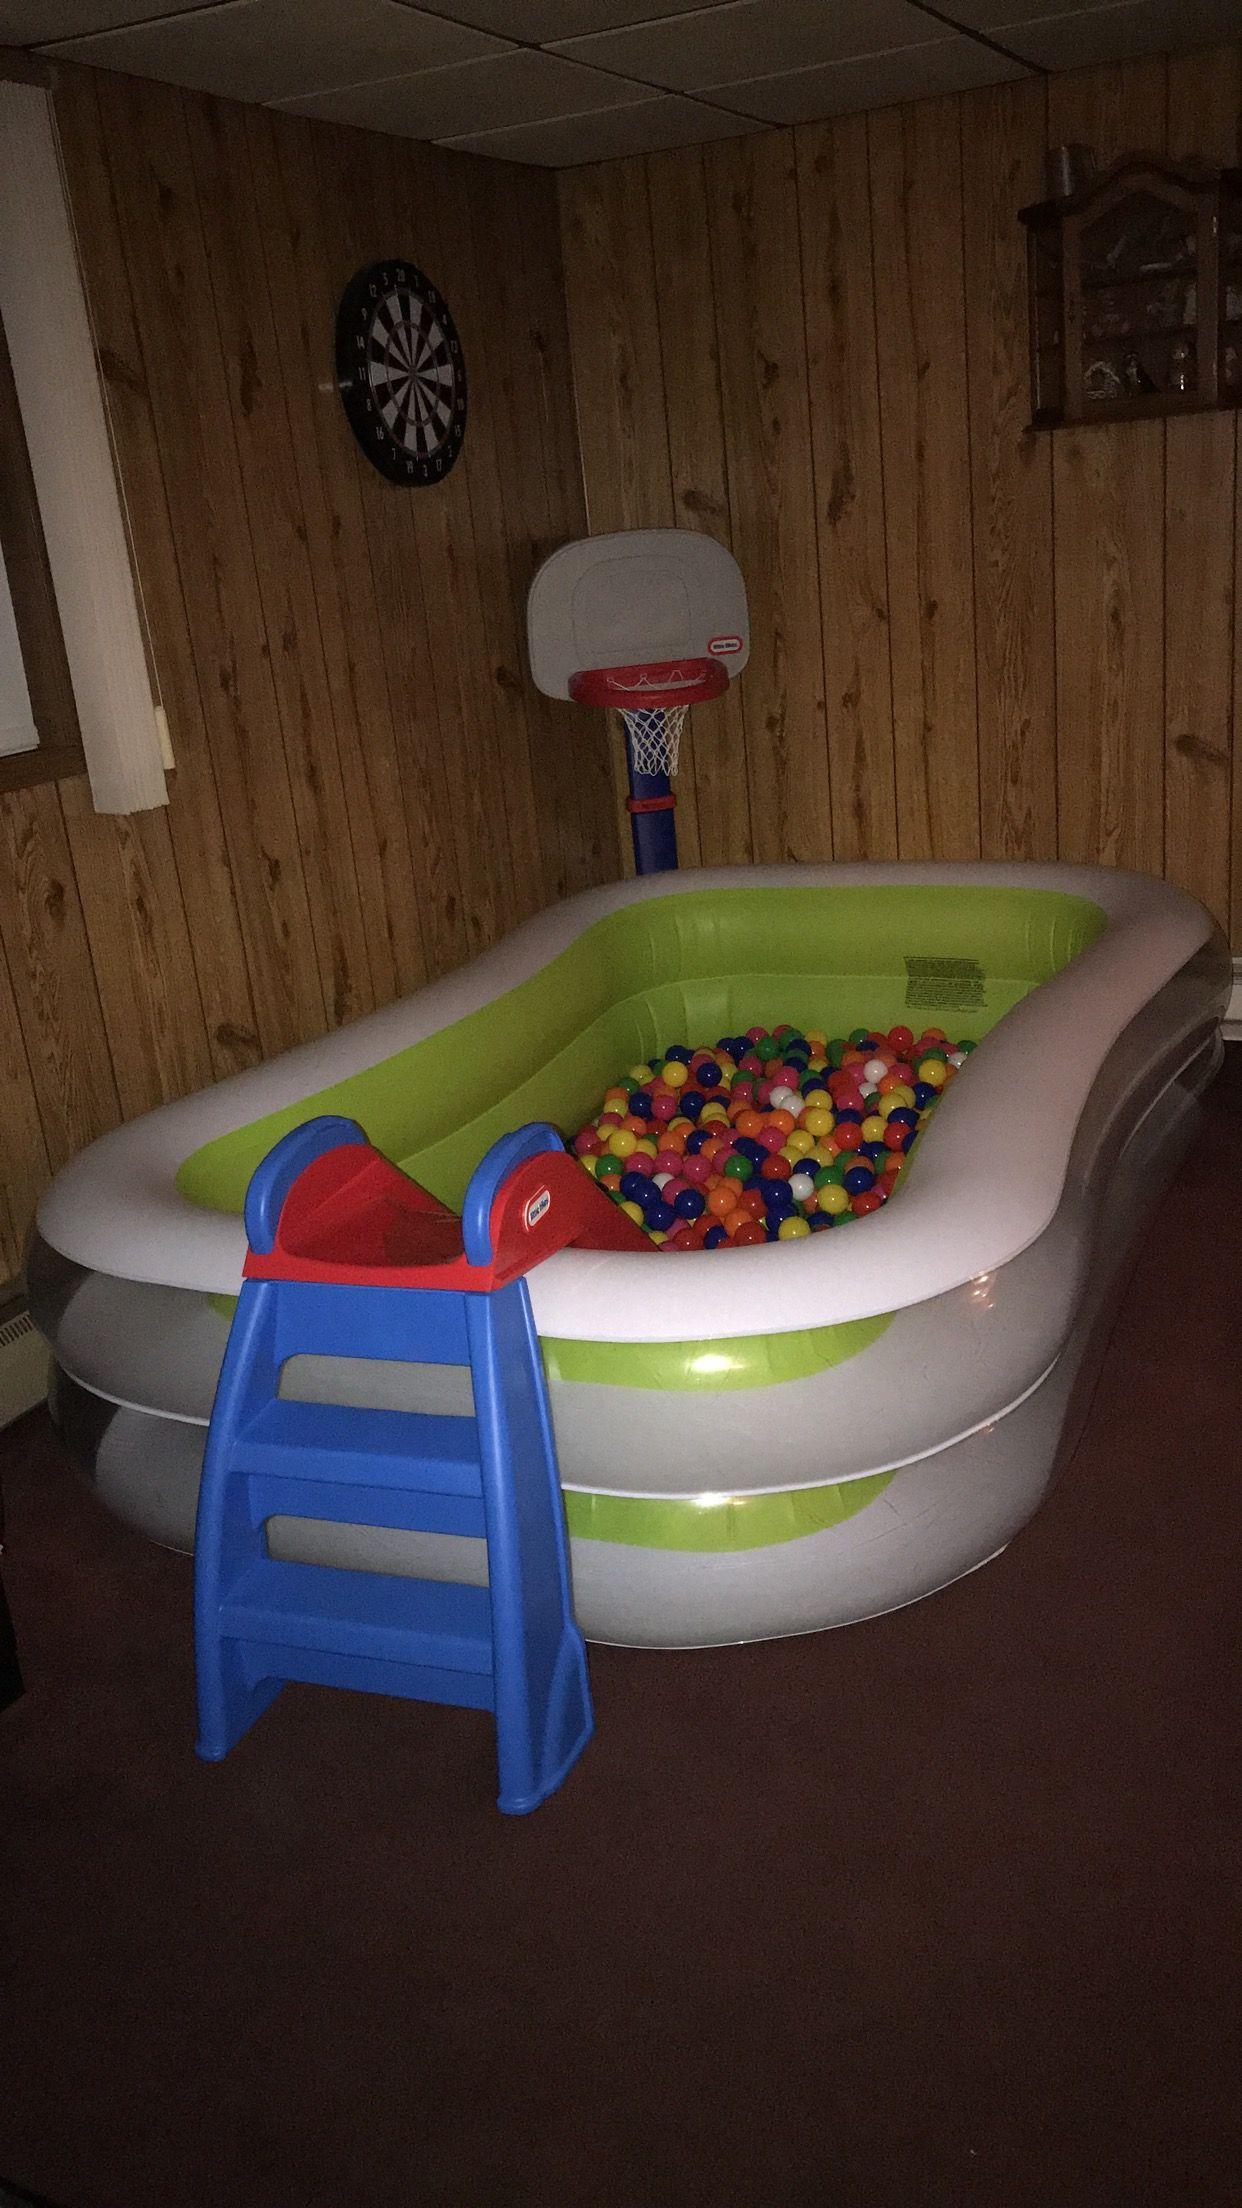 Ball Pit Goddaughter Playroom Baby Kids Bedroom